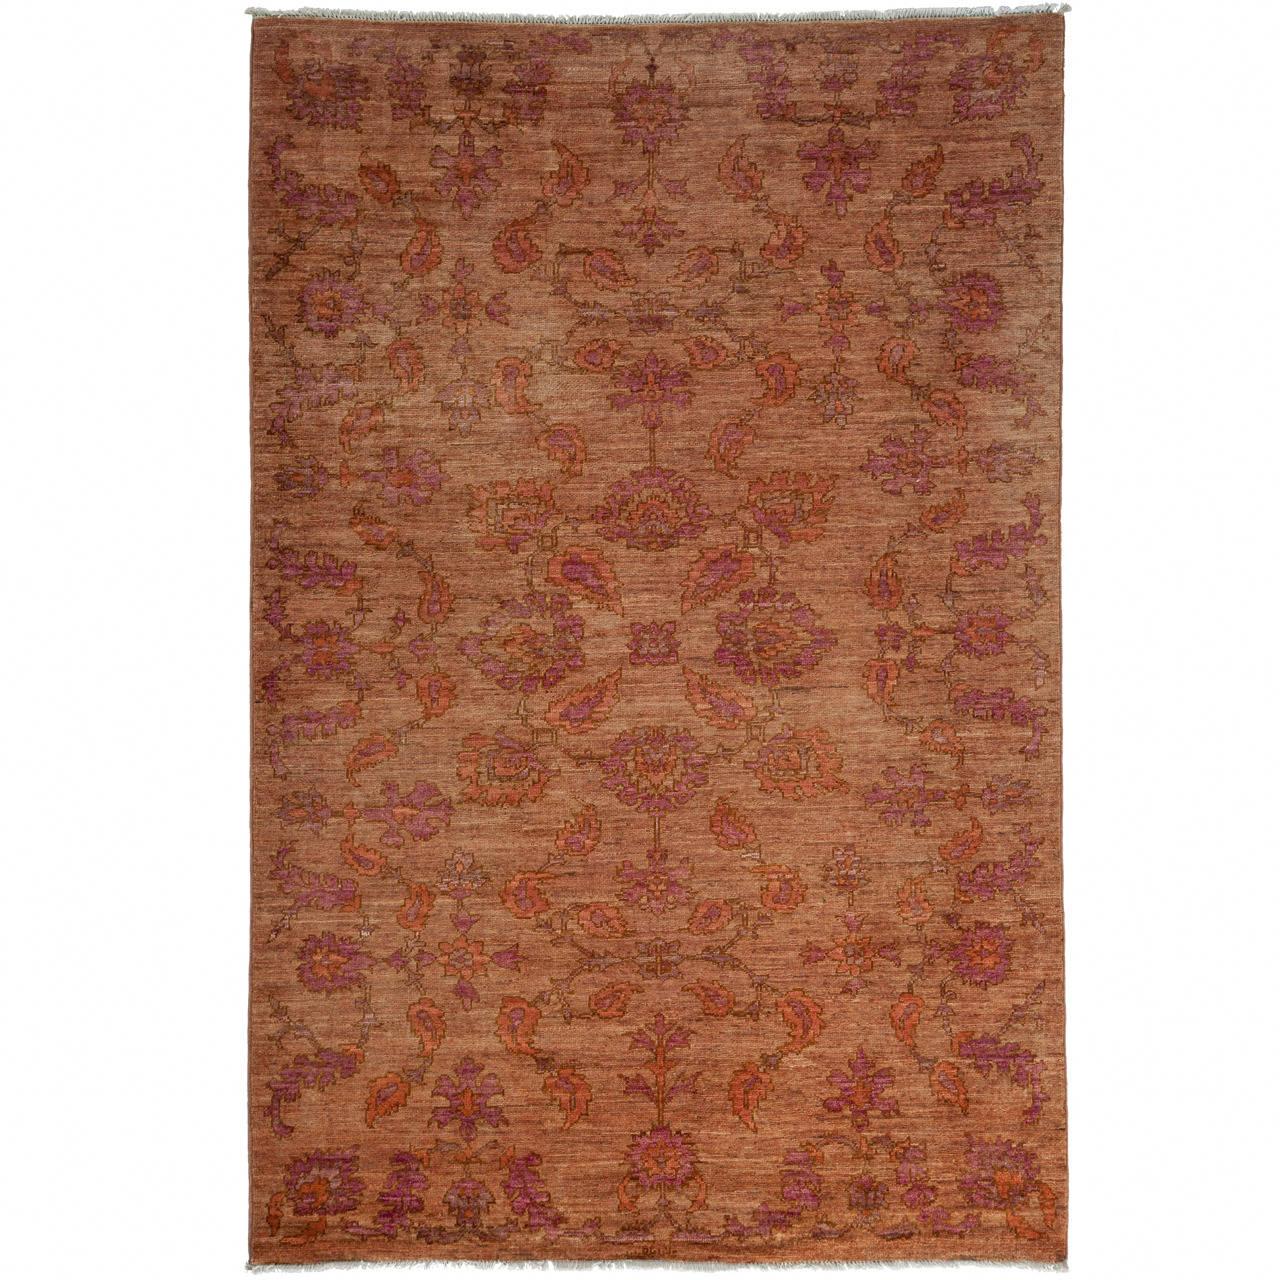 Pakistani Oushak, Hand-Knotted Oriental Rug